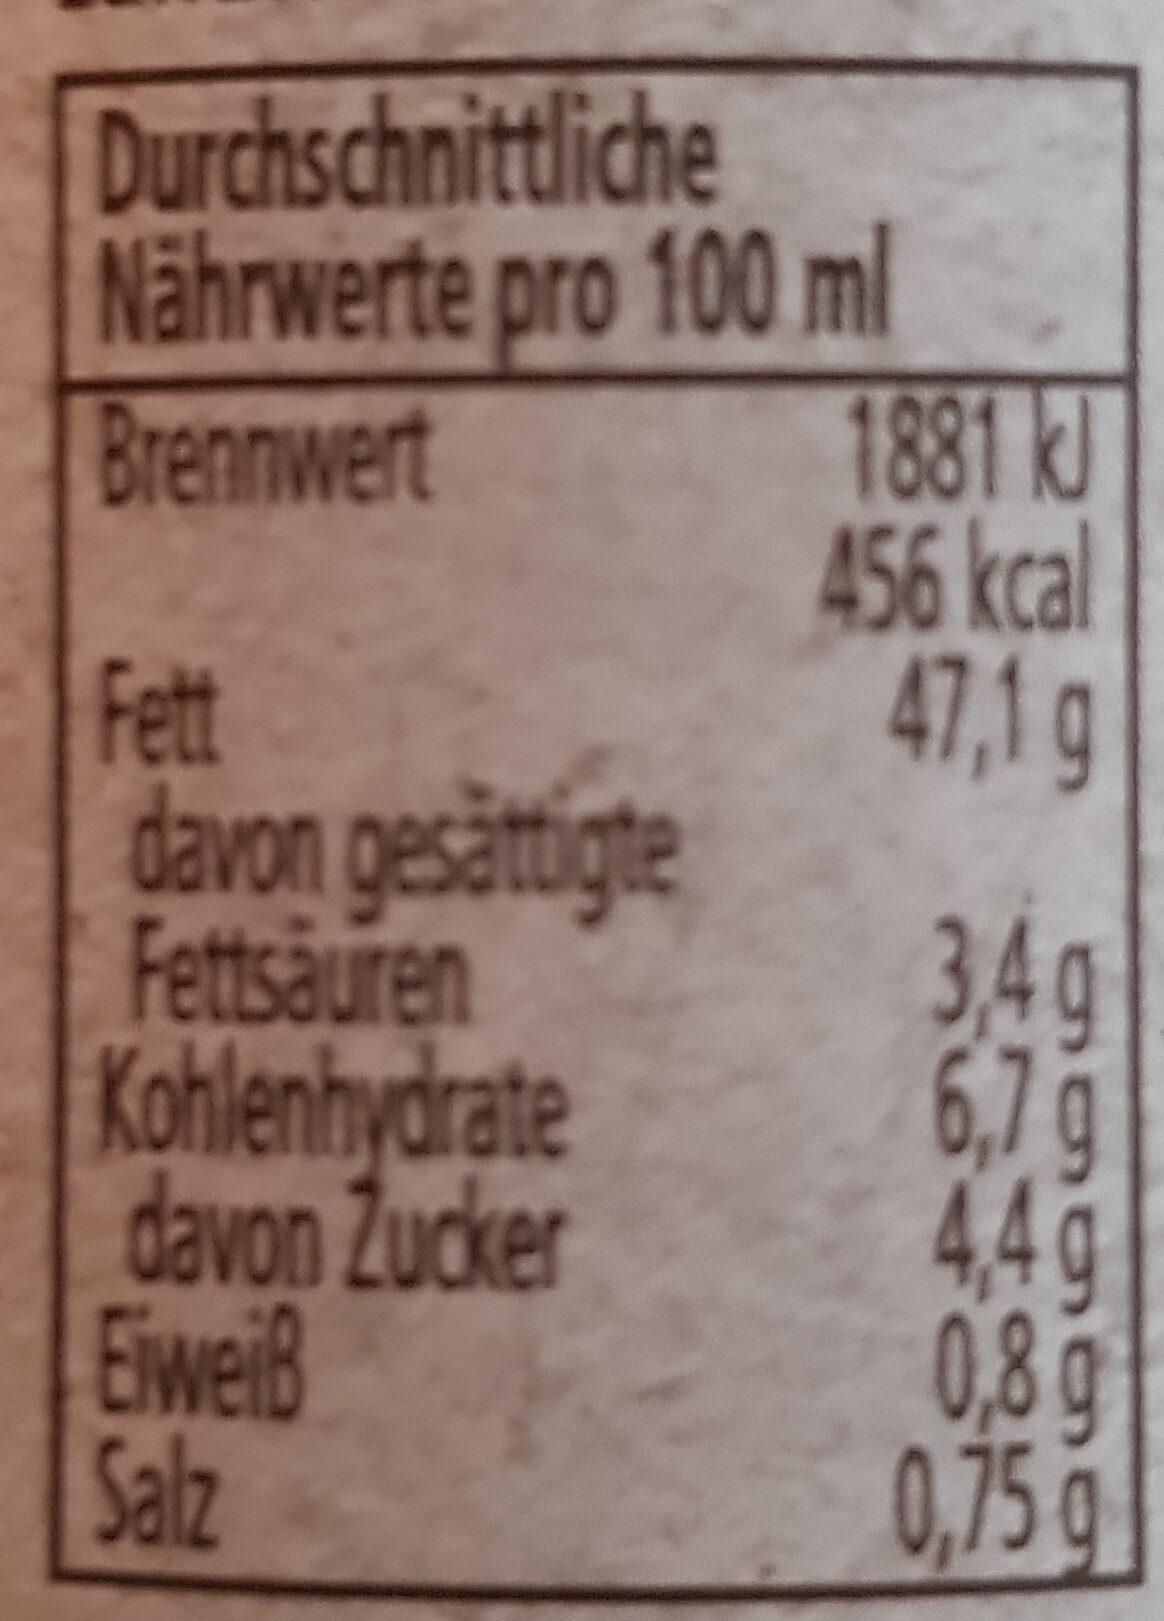 Vegane Salat-Mayonnaise - Nährwertangaben